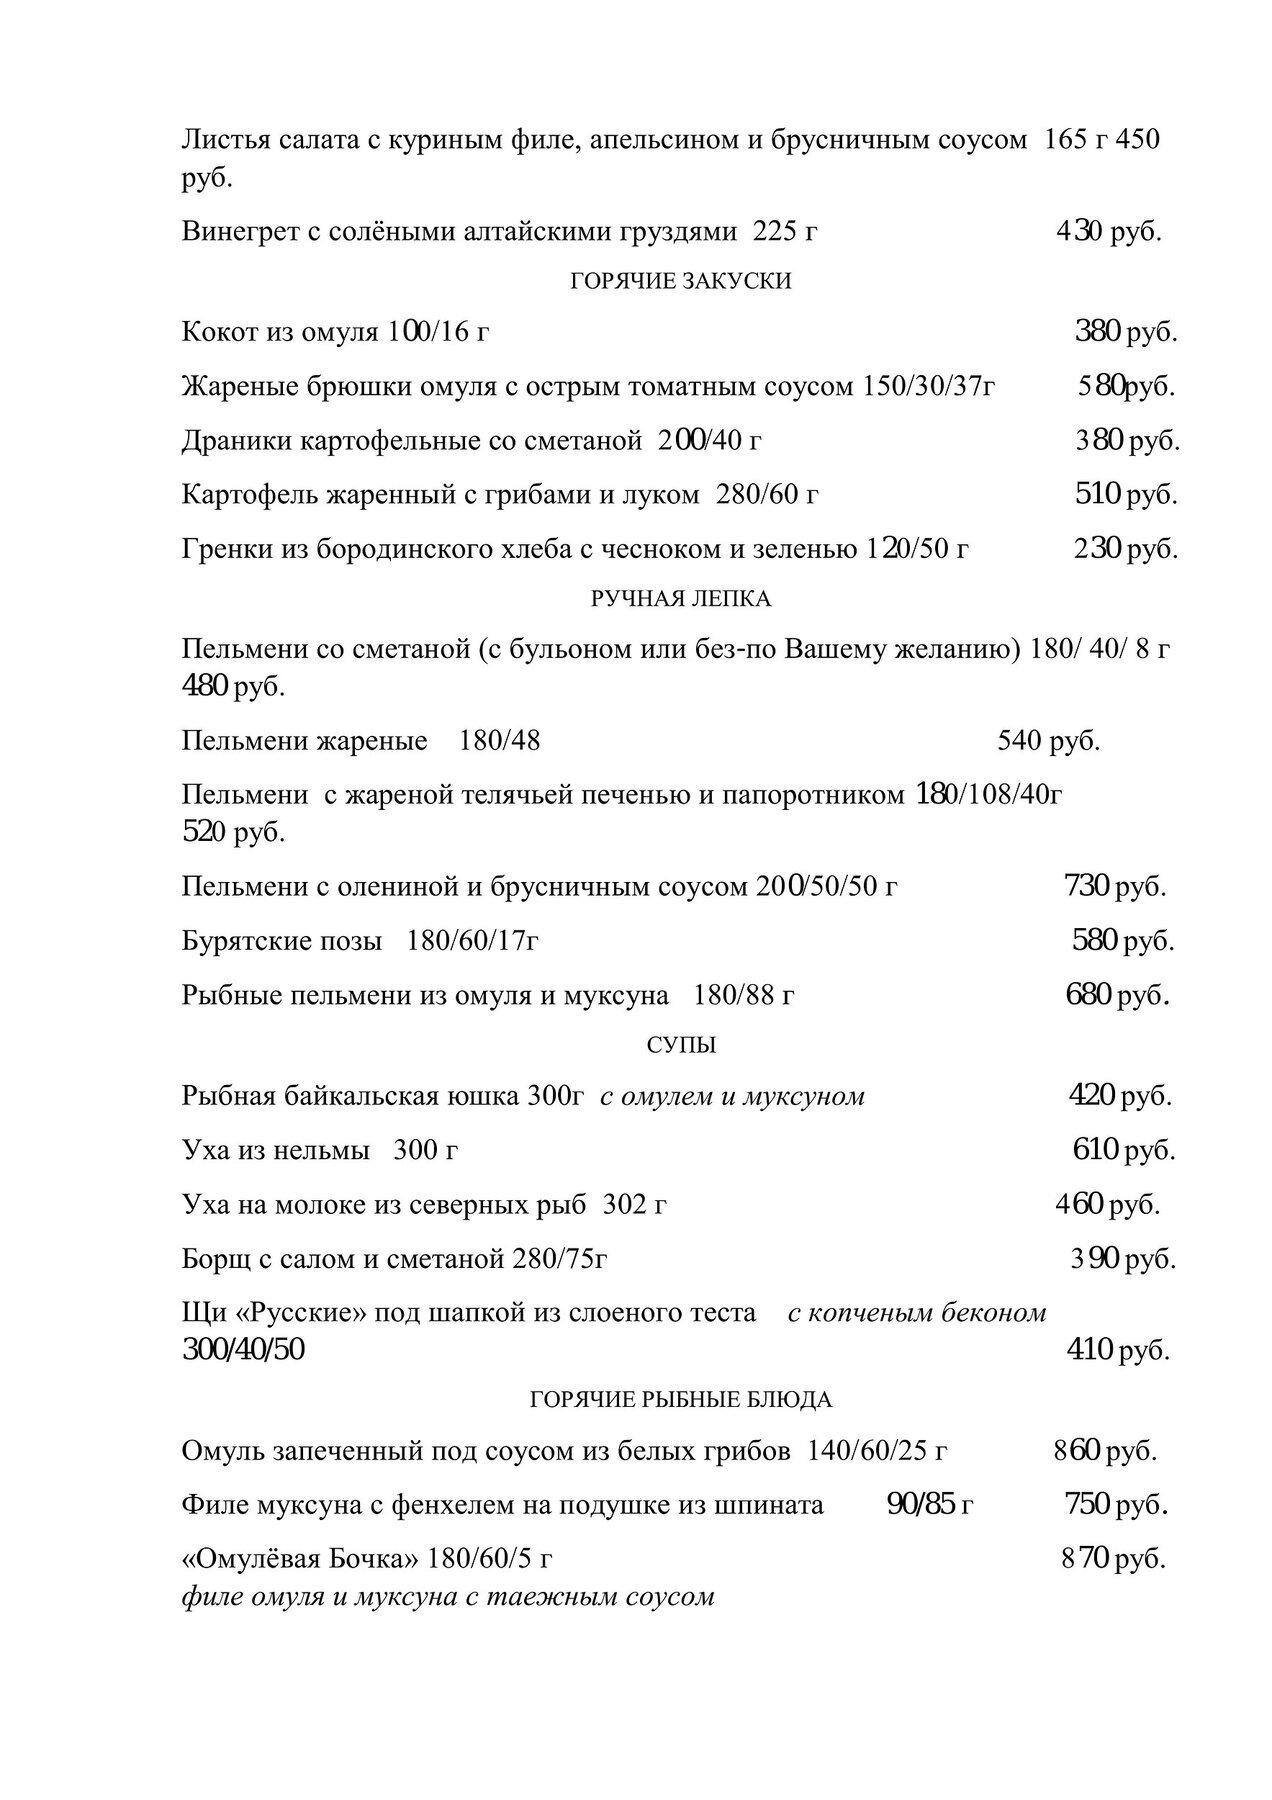 Меню ресторана Омулевая Бочка на улице Покровка фото 5